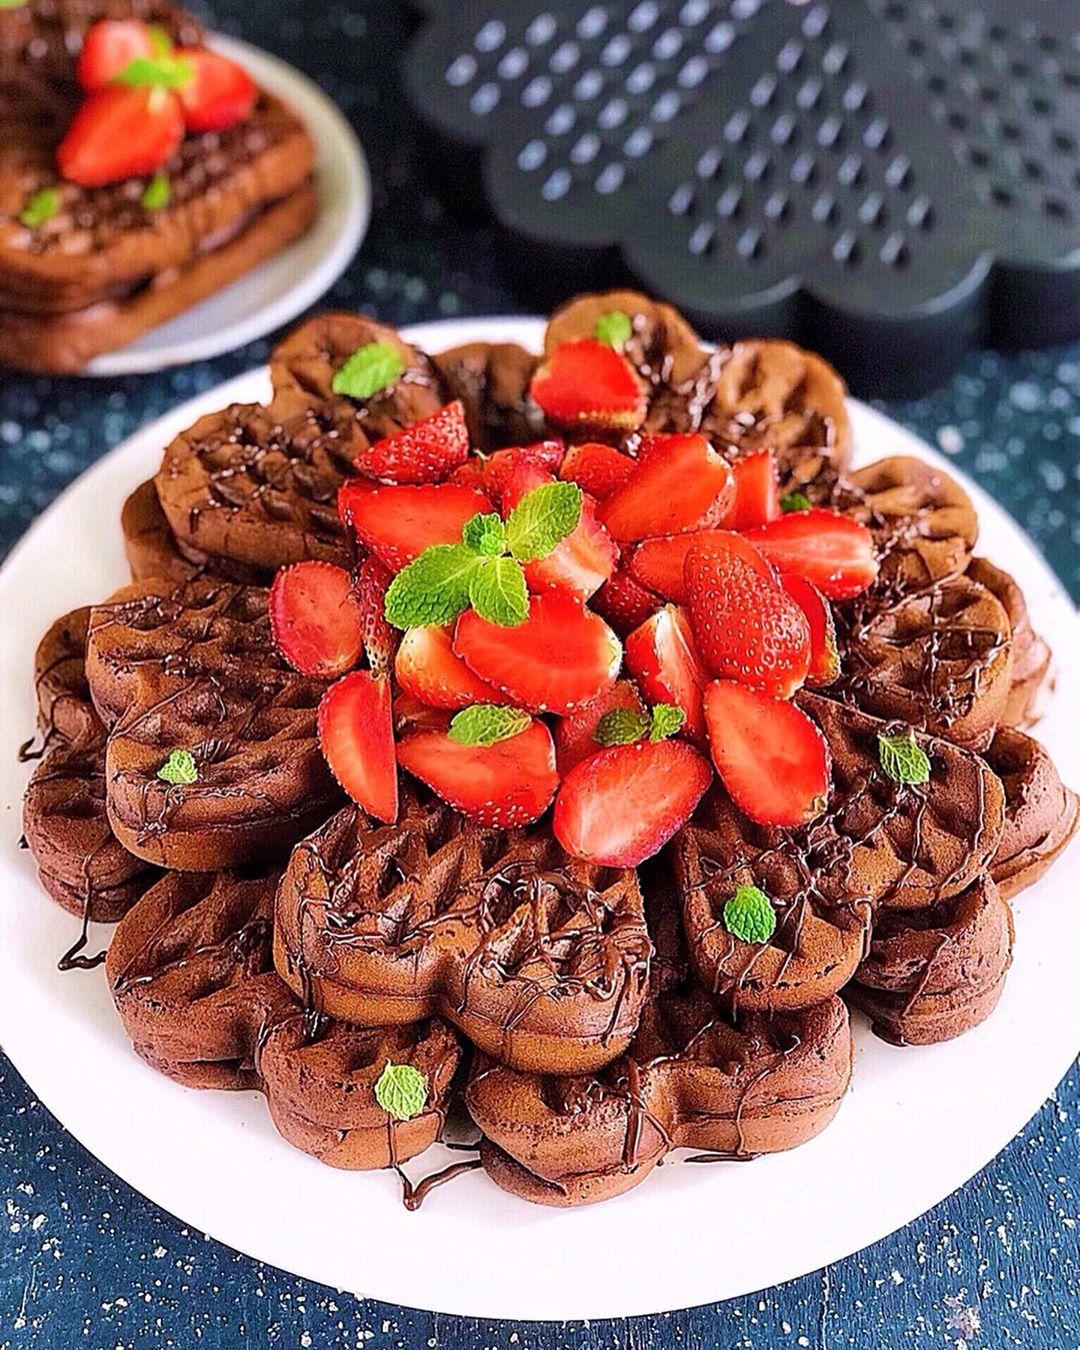 Resep Waffle Coklat Belgian Dan Cara Membuat Belgian Chocolate Waffle Lengkap Bahan Bikin Waffle Topping Stroberi Serta Resep Resep Makanan Resep Masakan Resep